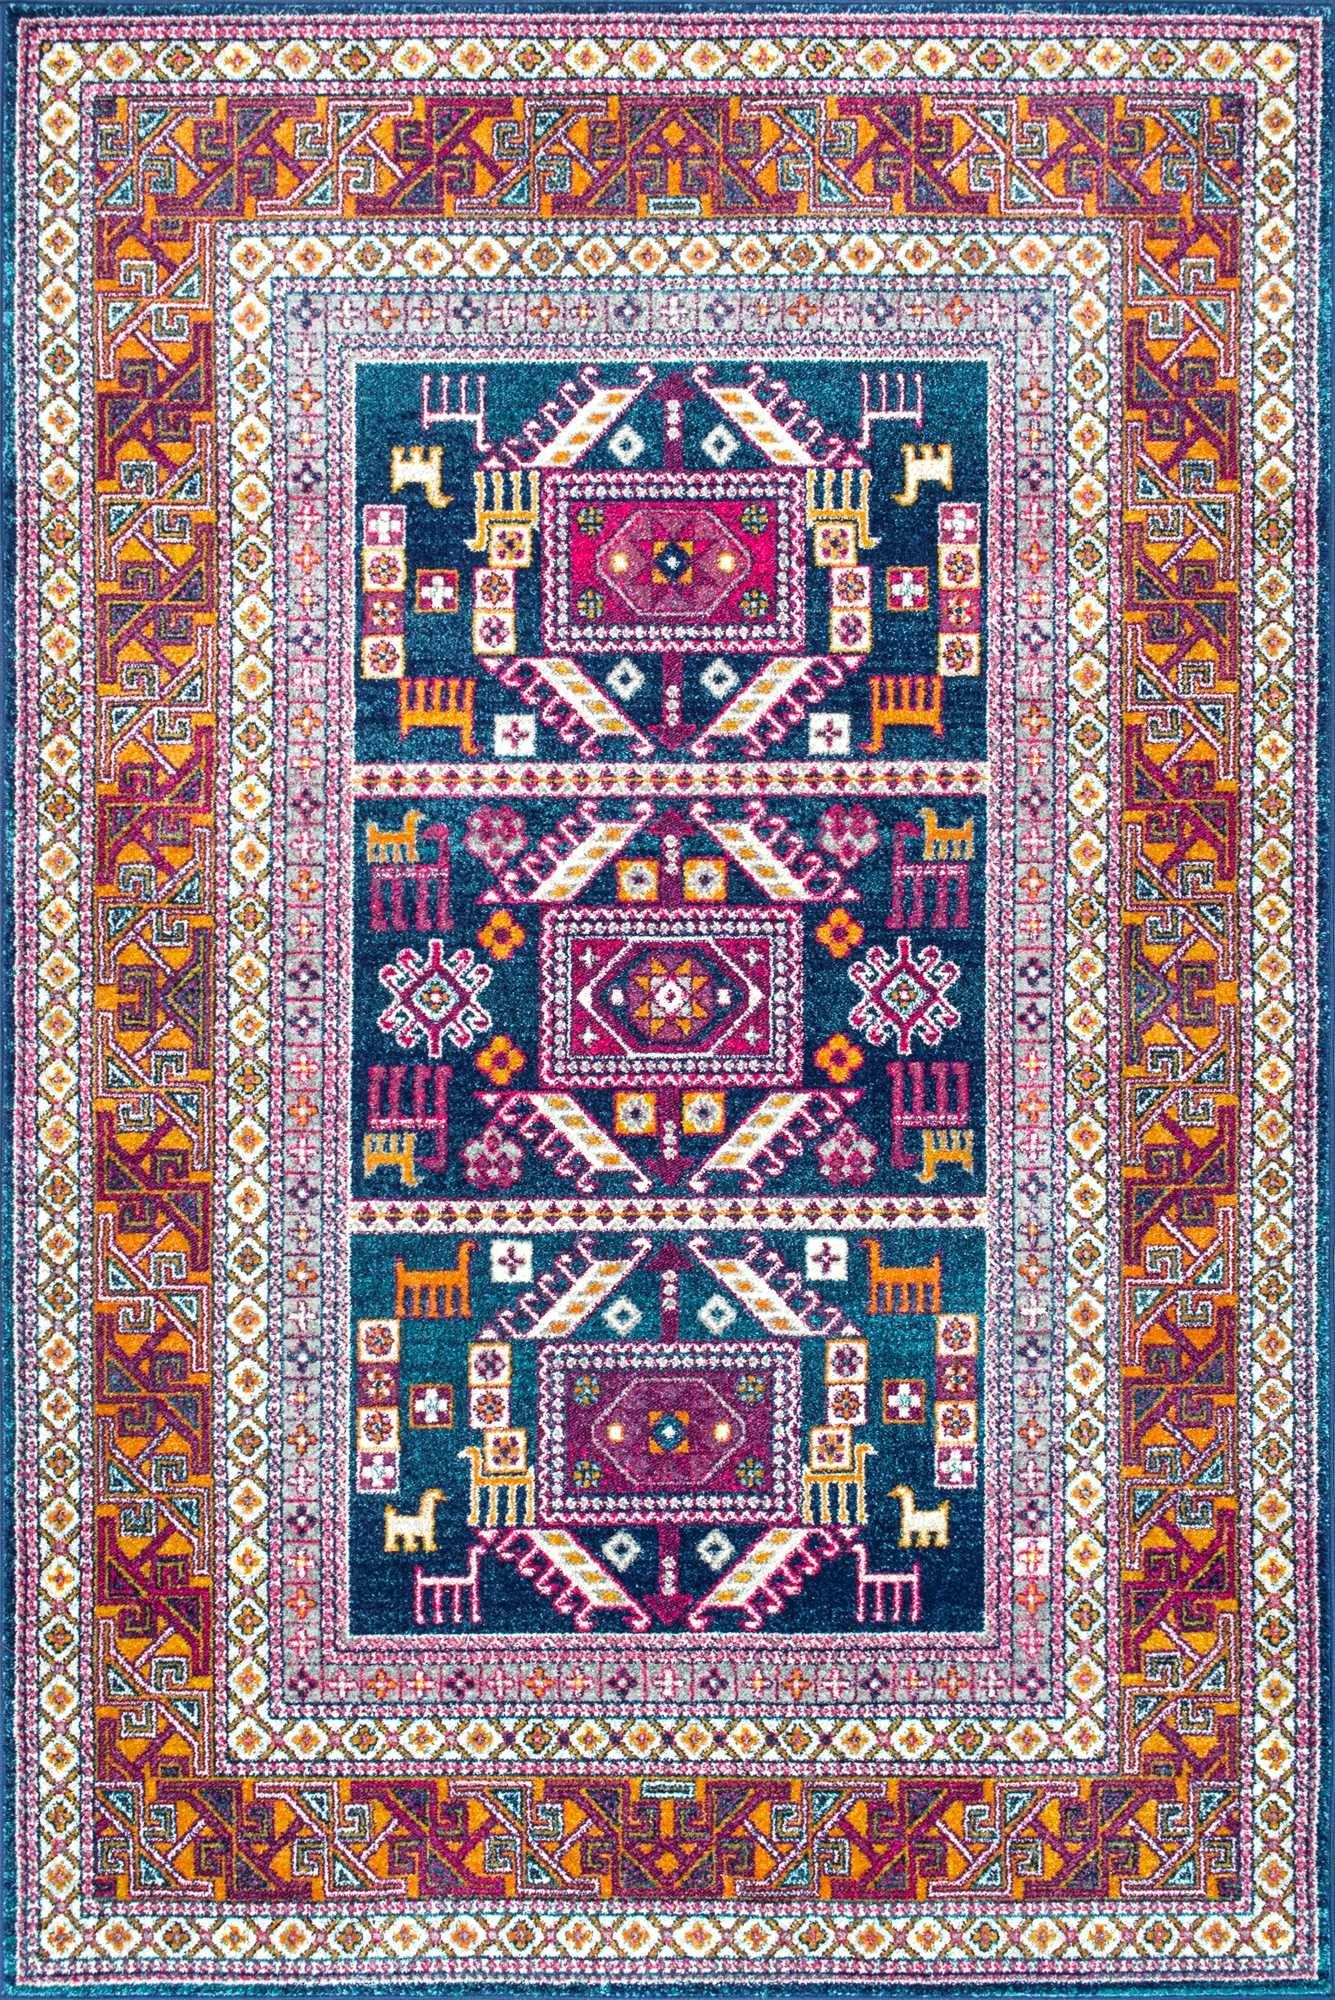 Bosphorus Bd48 Tecumseh Tribal Tale Triptych Rug This